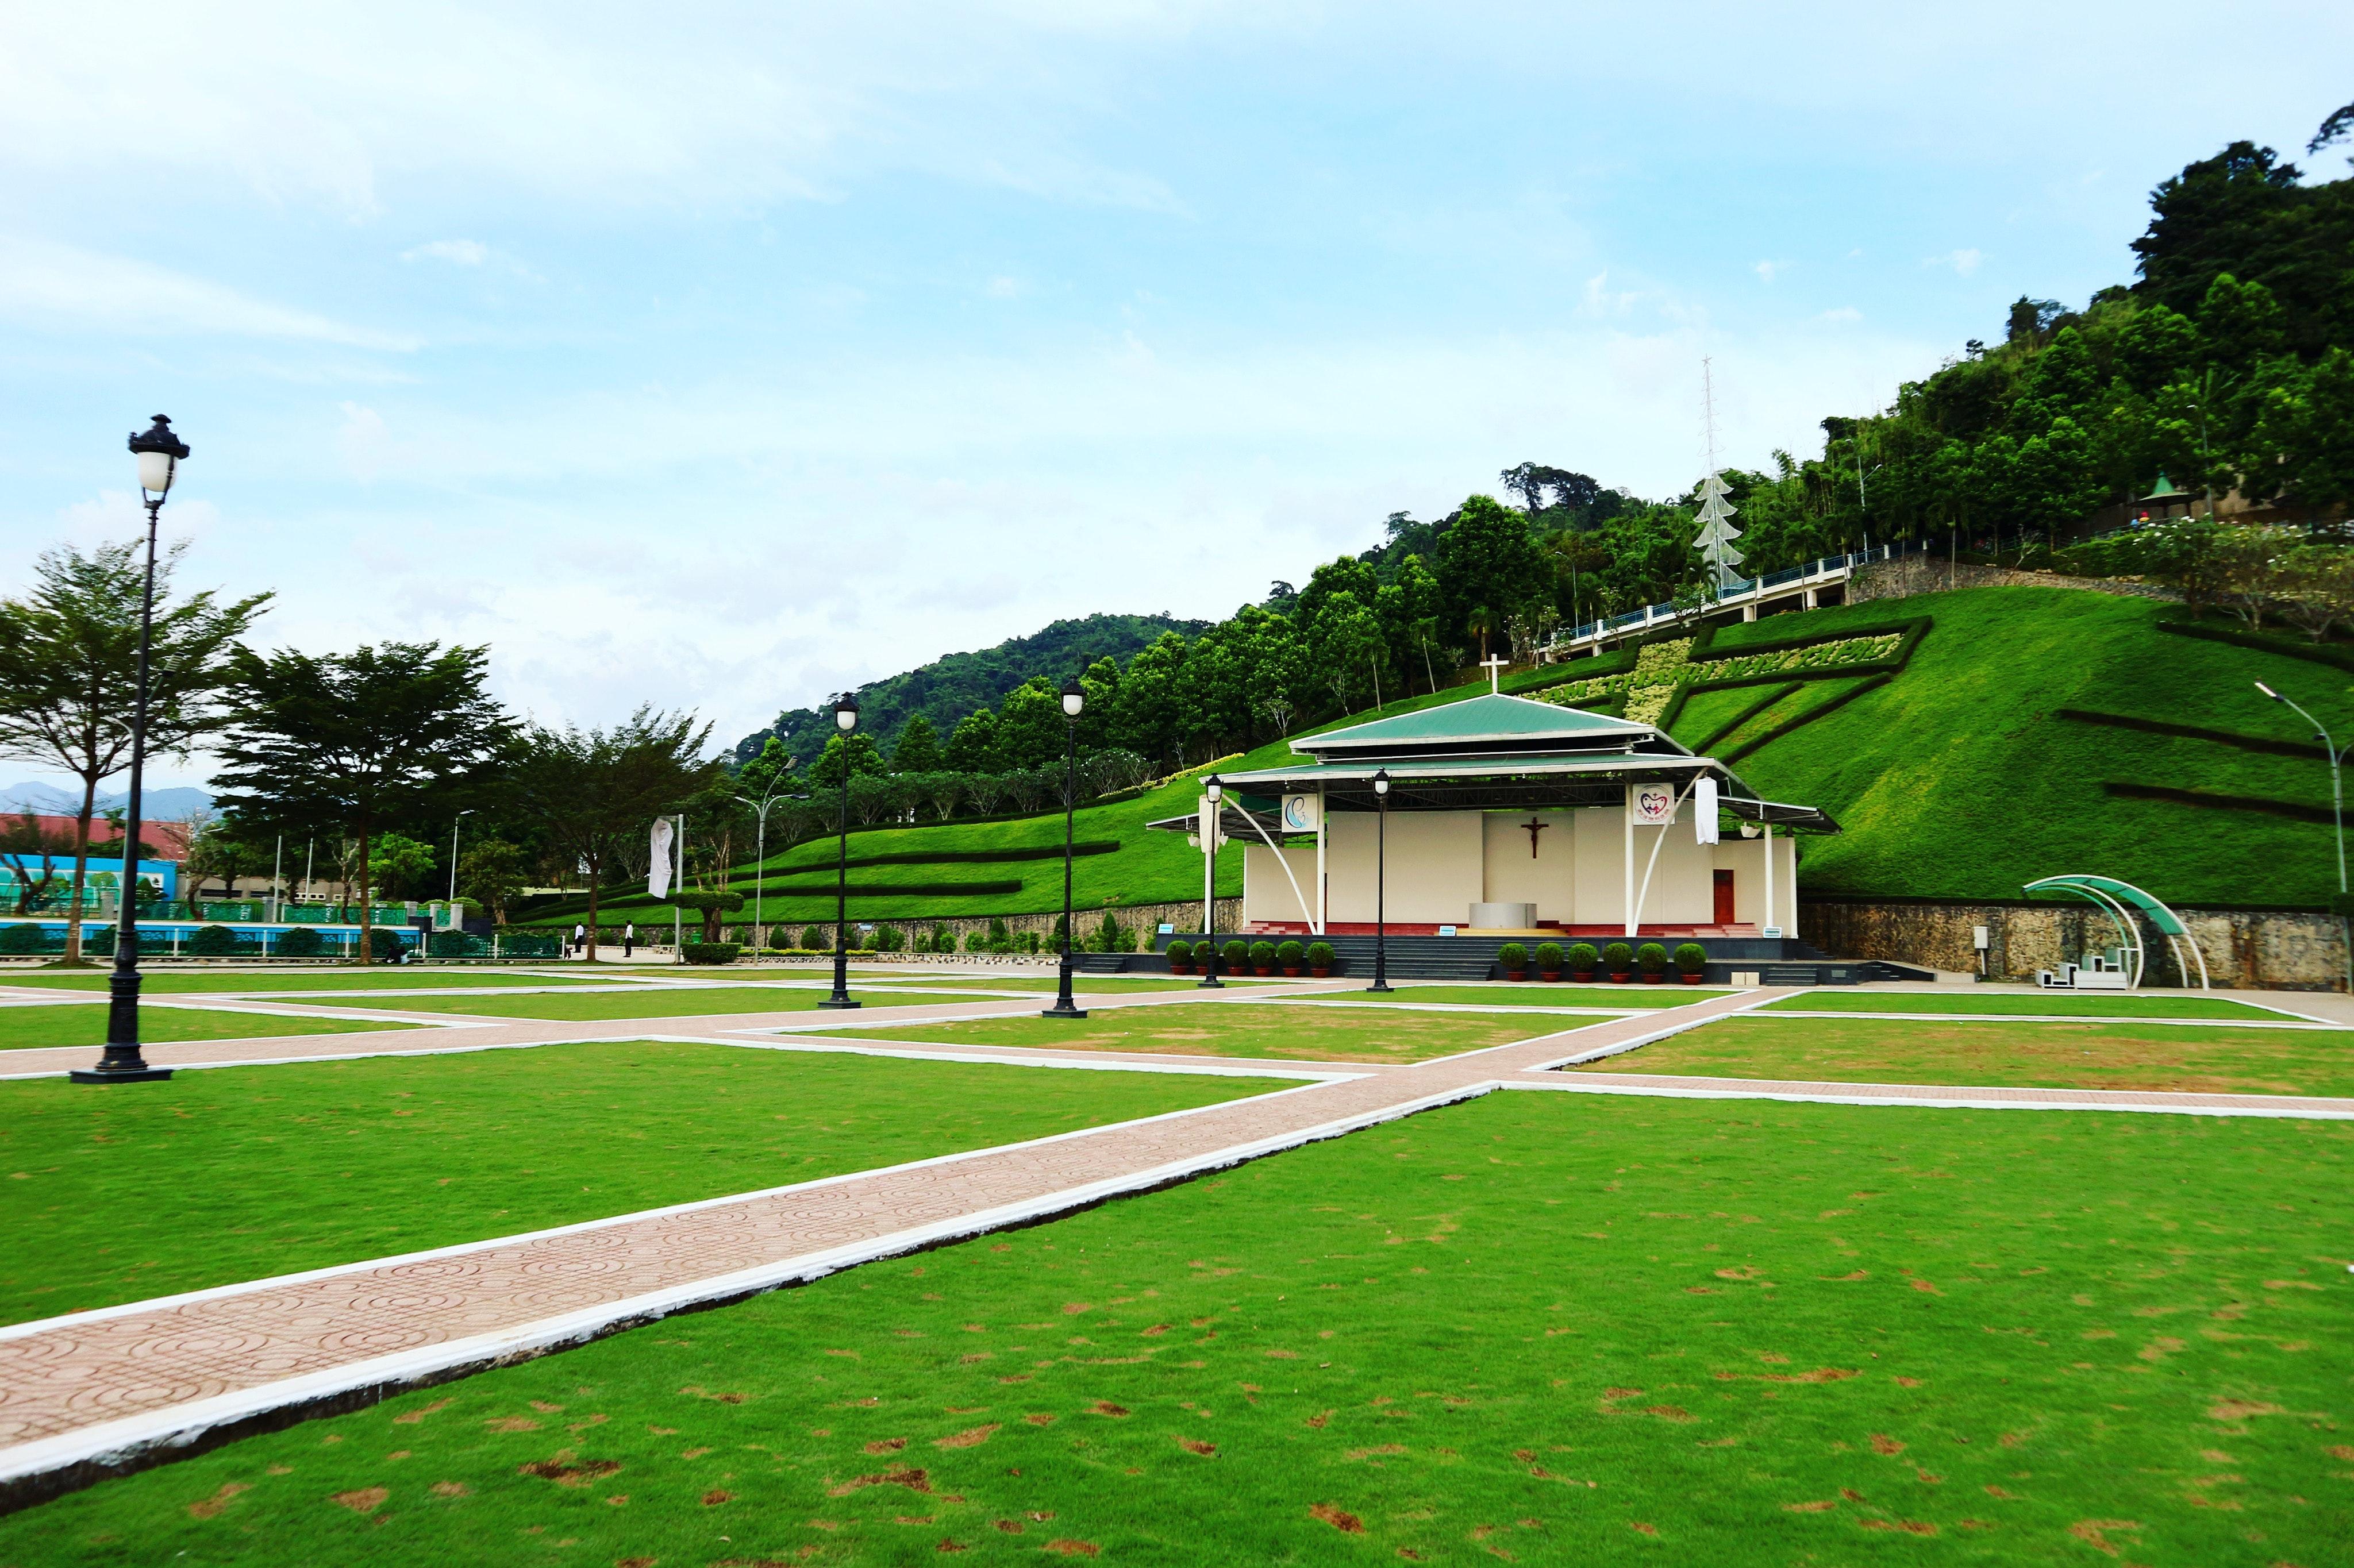 Green park photo